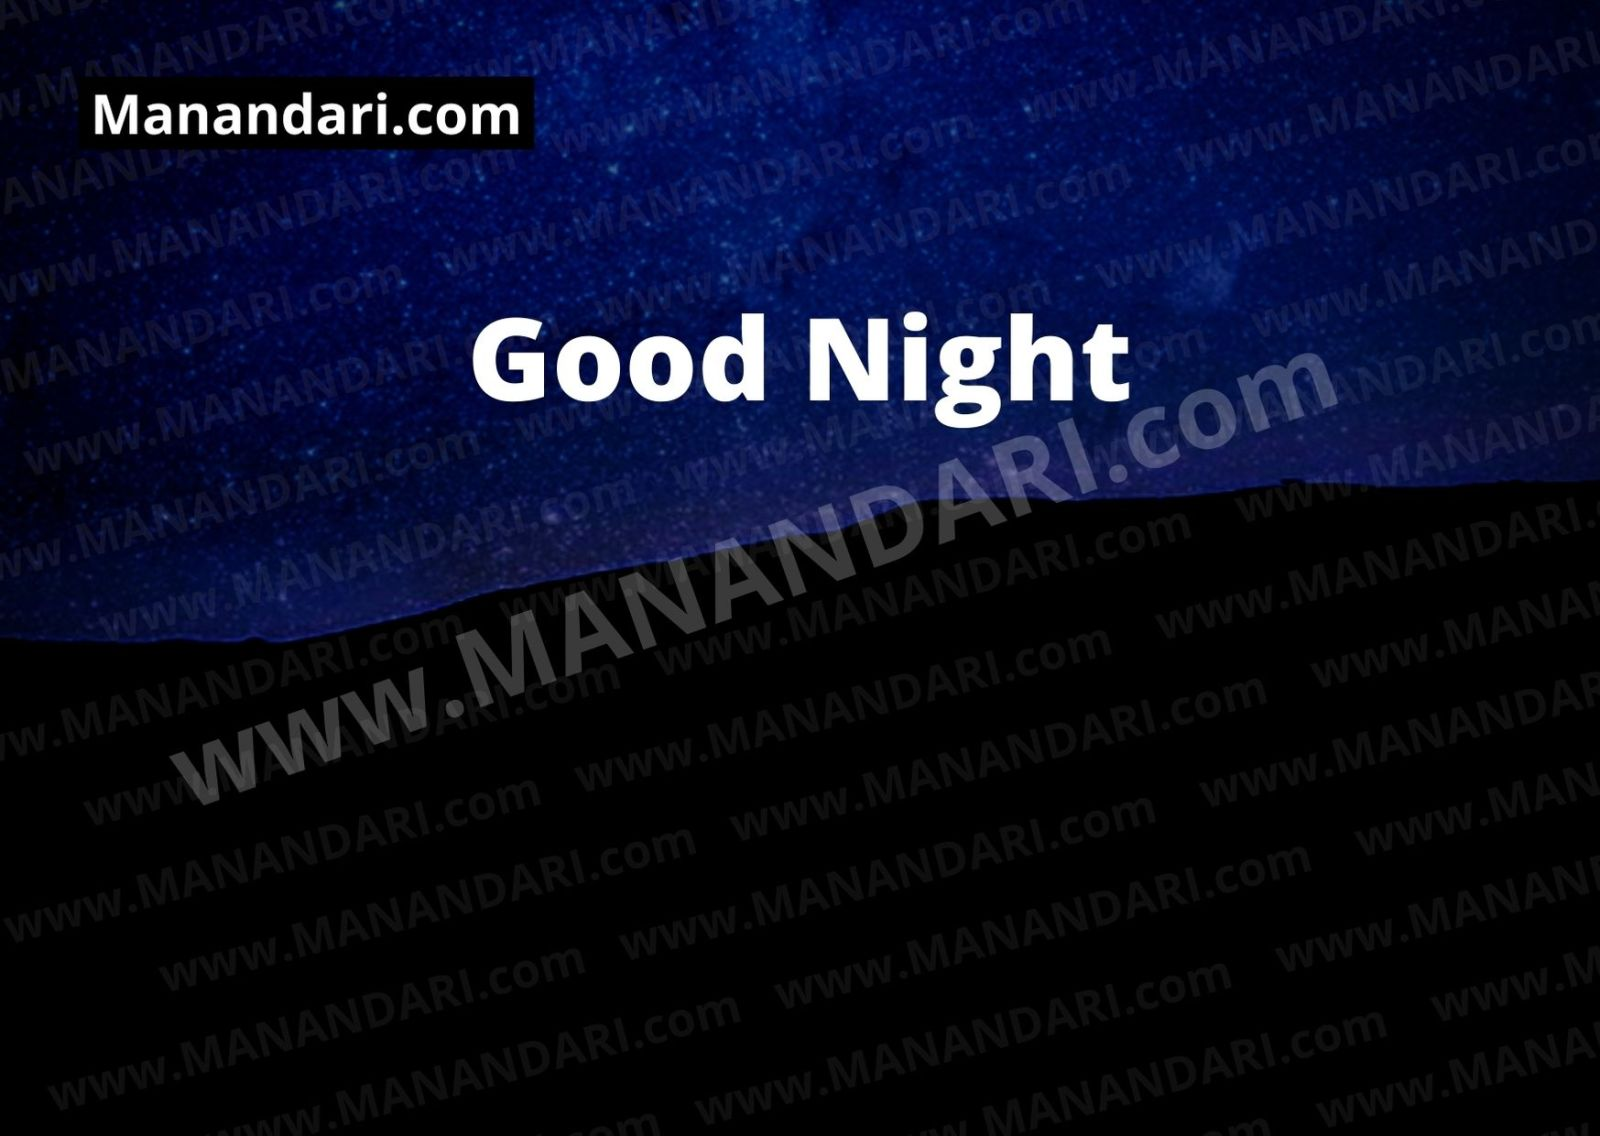 Good Night - 8